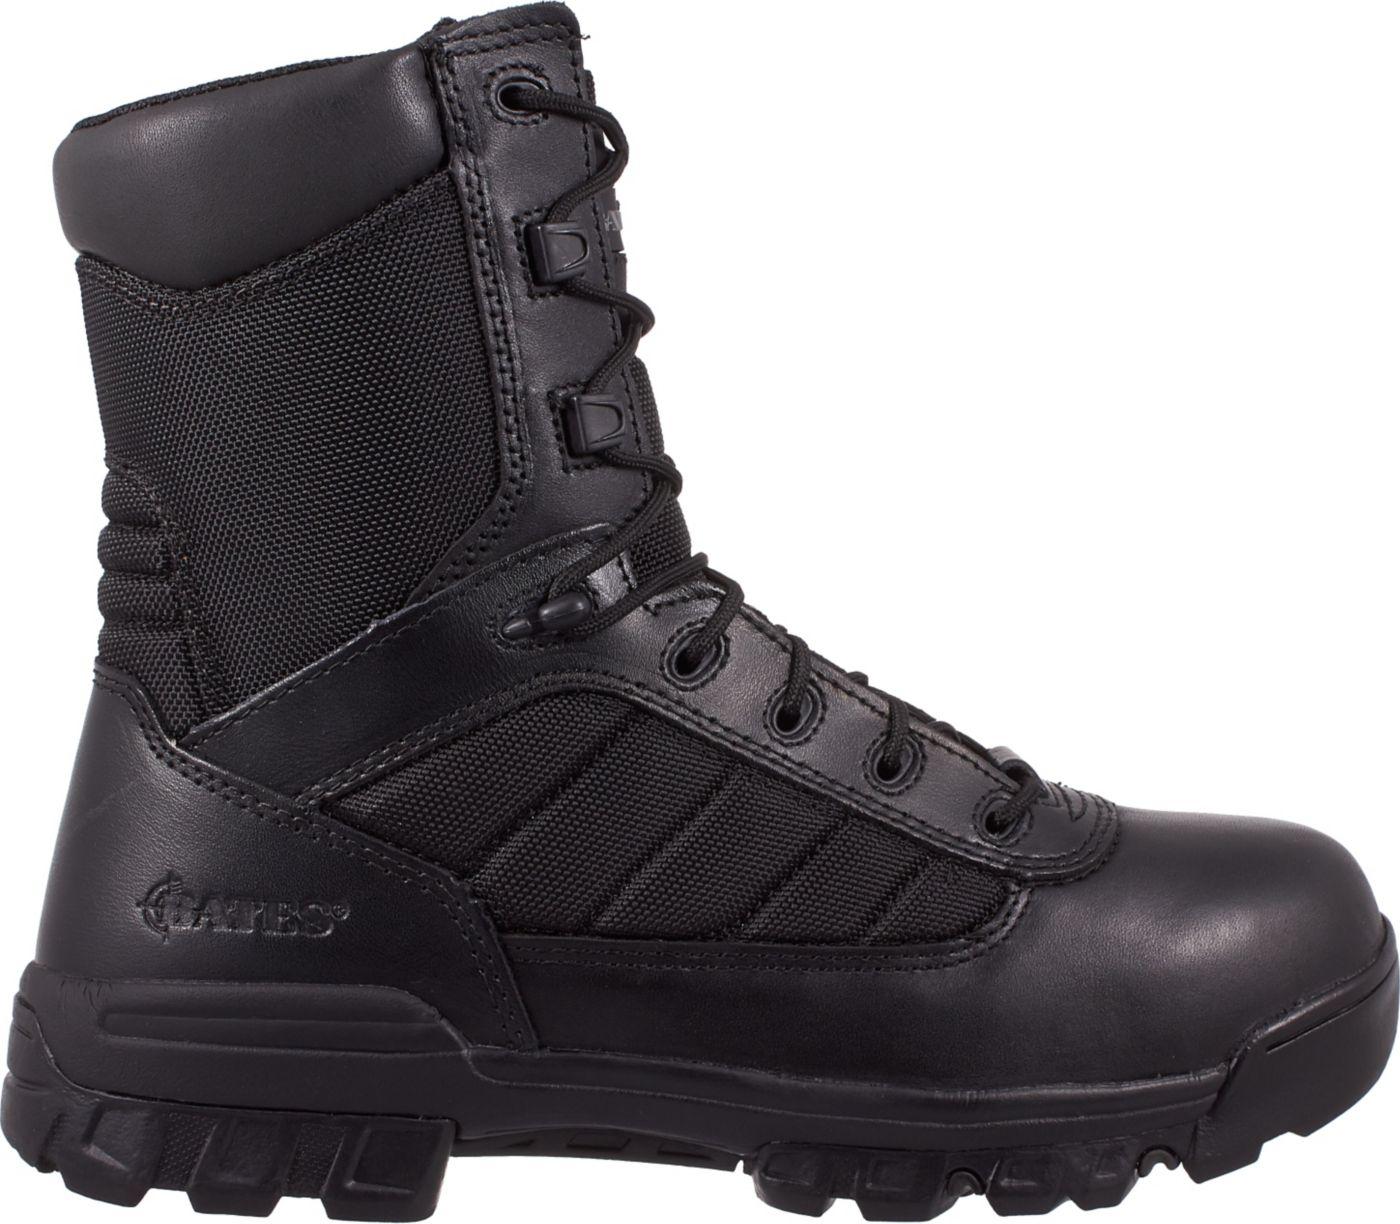 Bates Men's Enforcer Side Zip Wide Work Boots